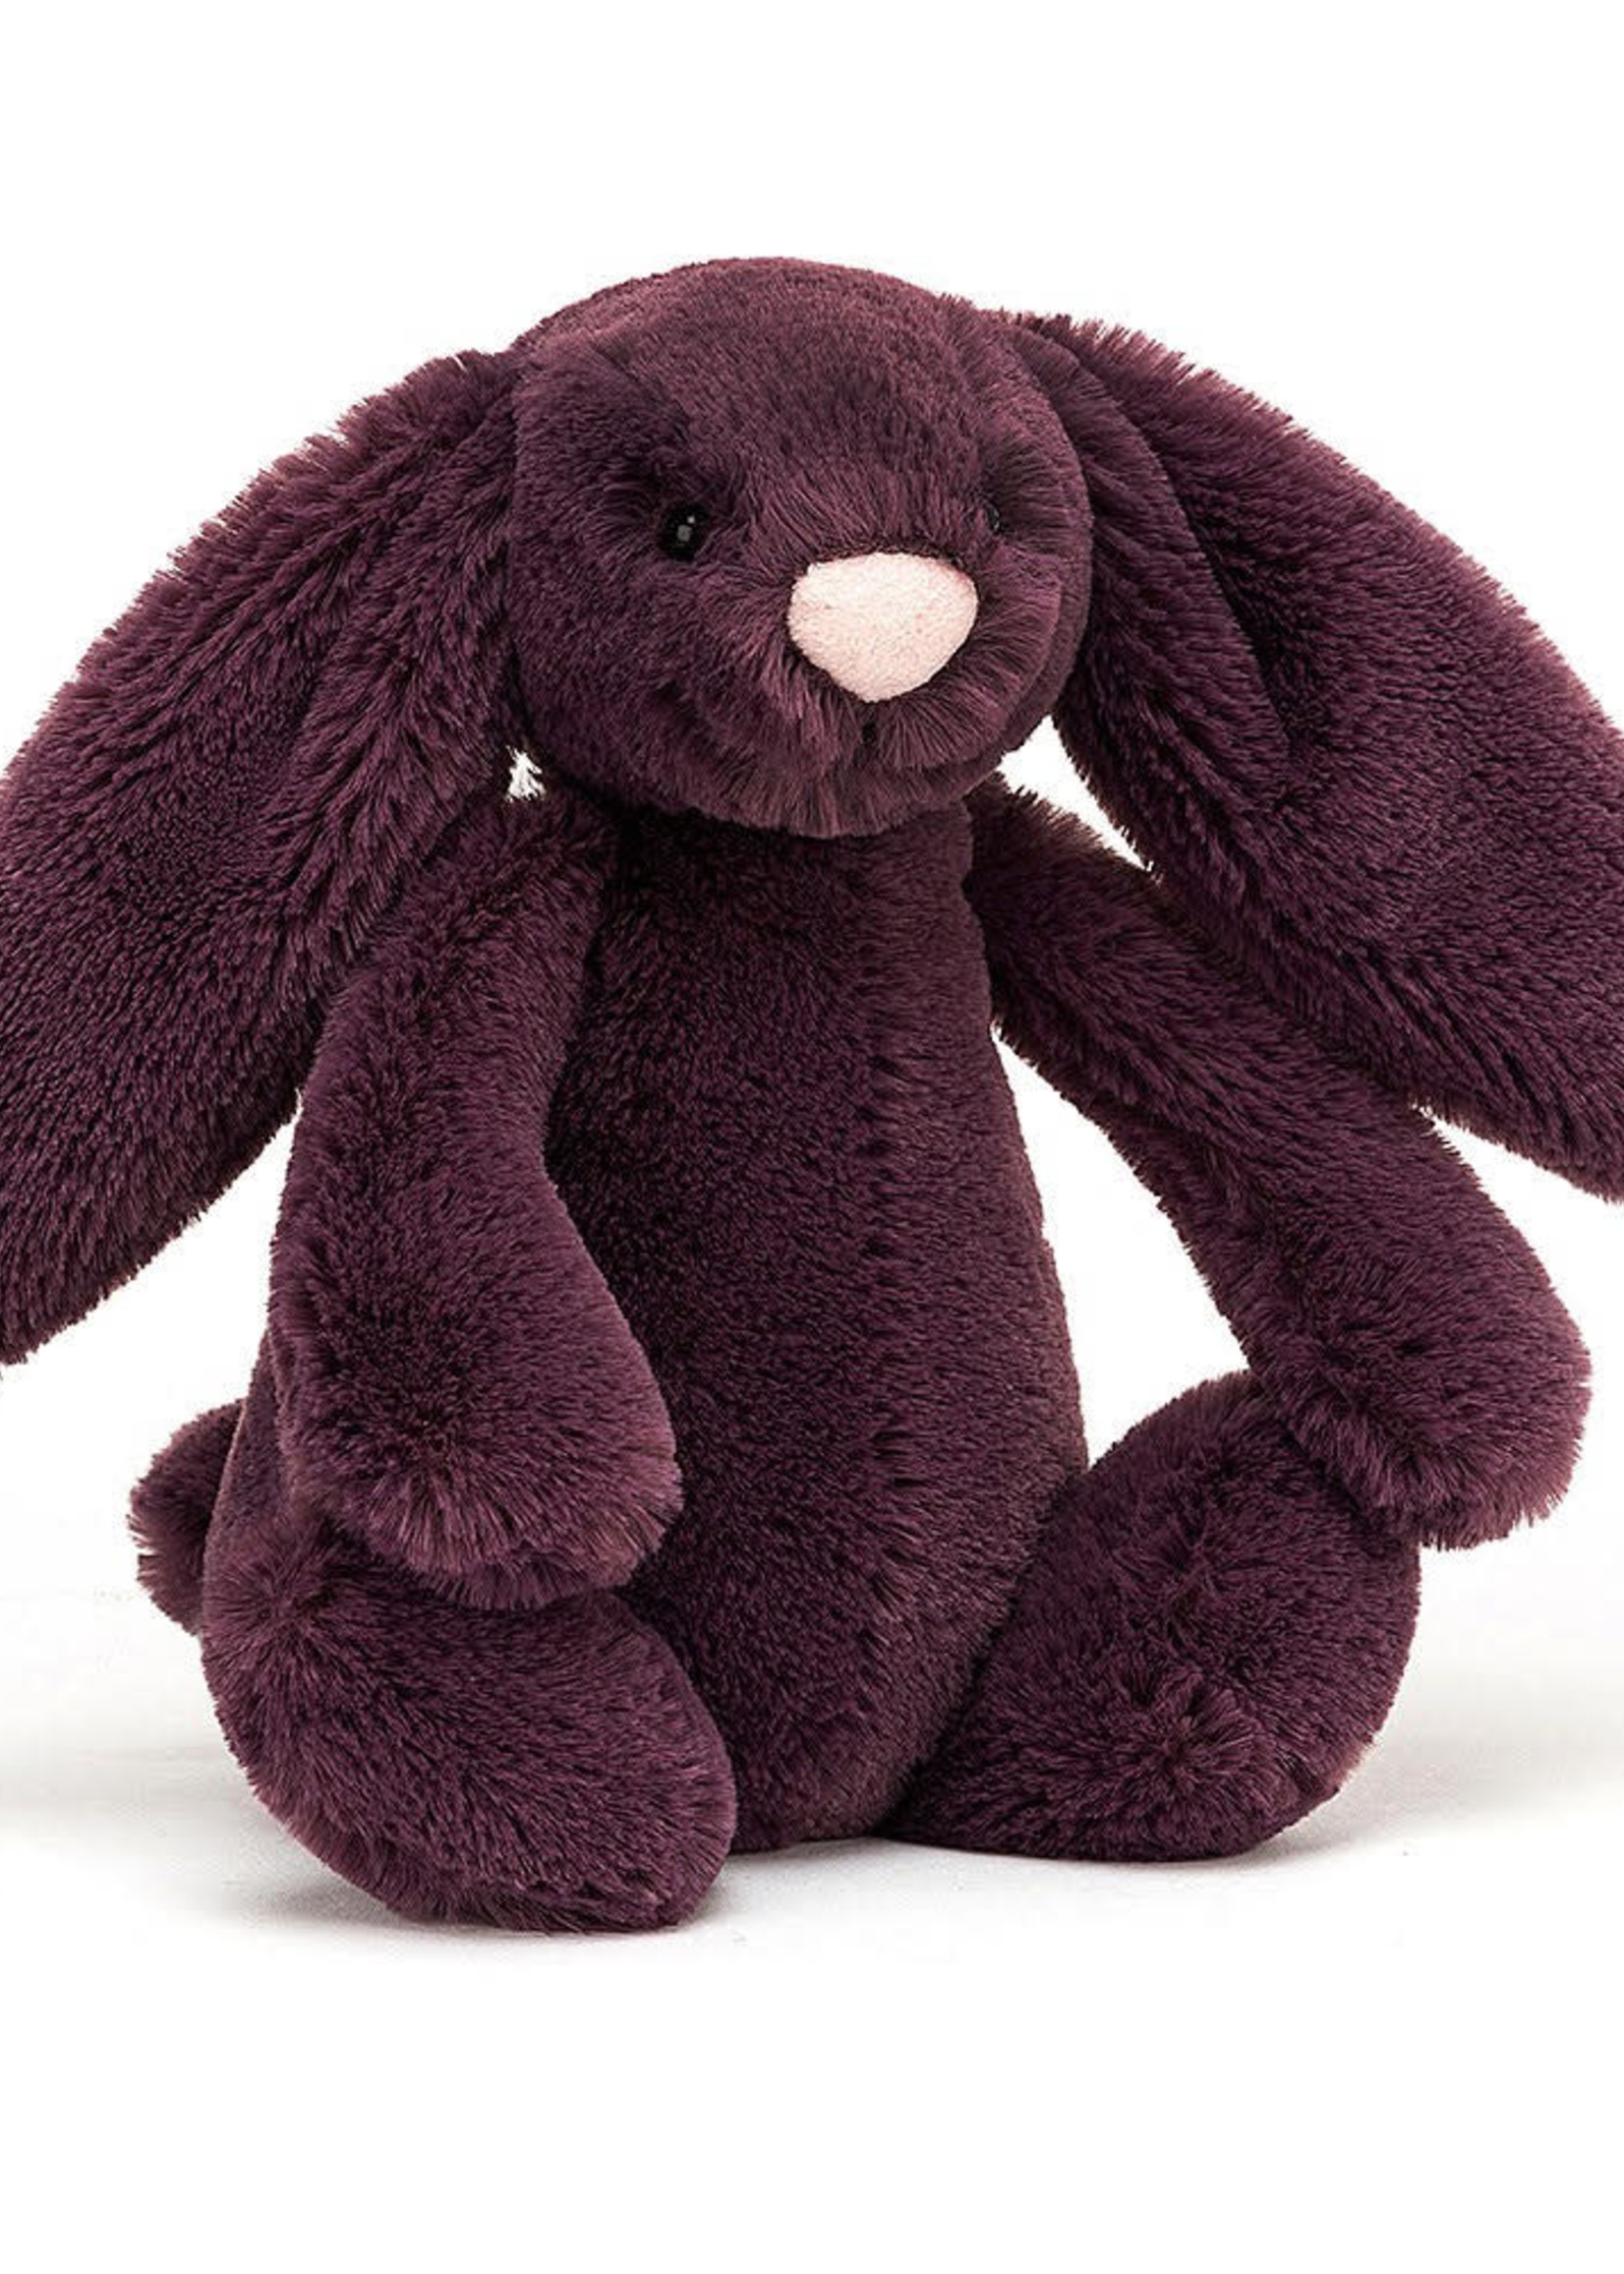 Jellycat JC Small Bashful Plum Bunny